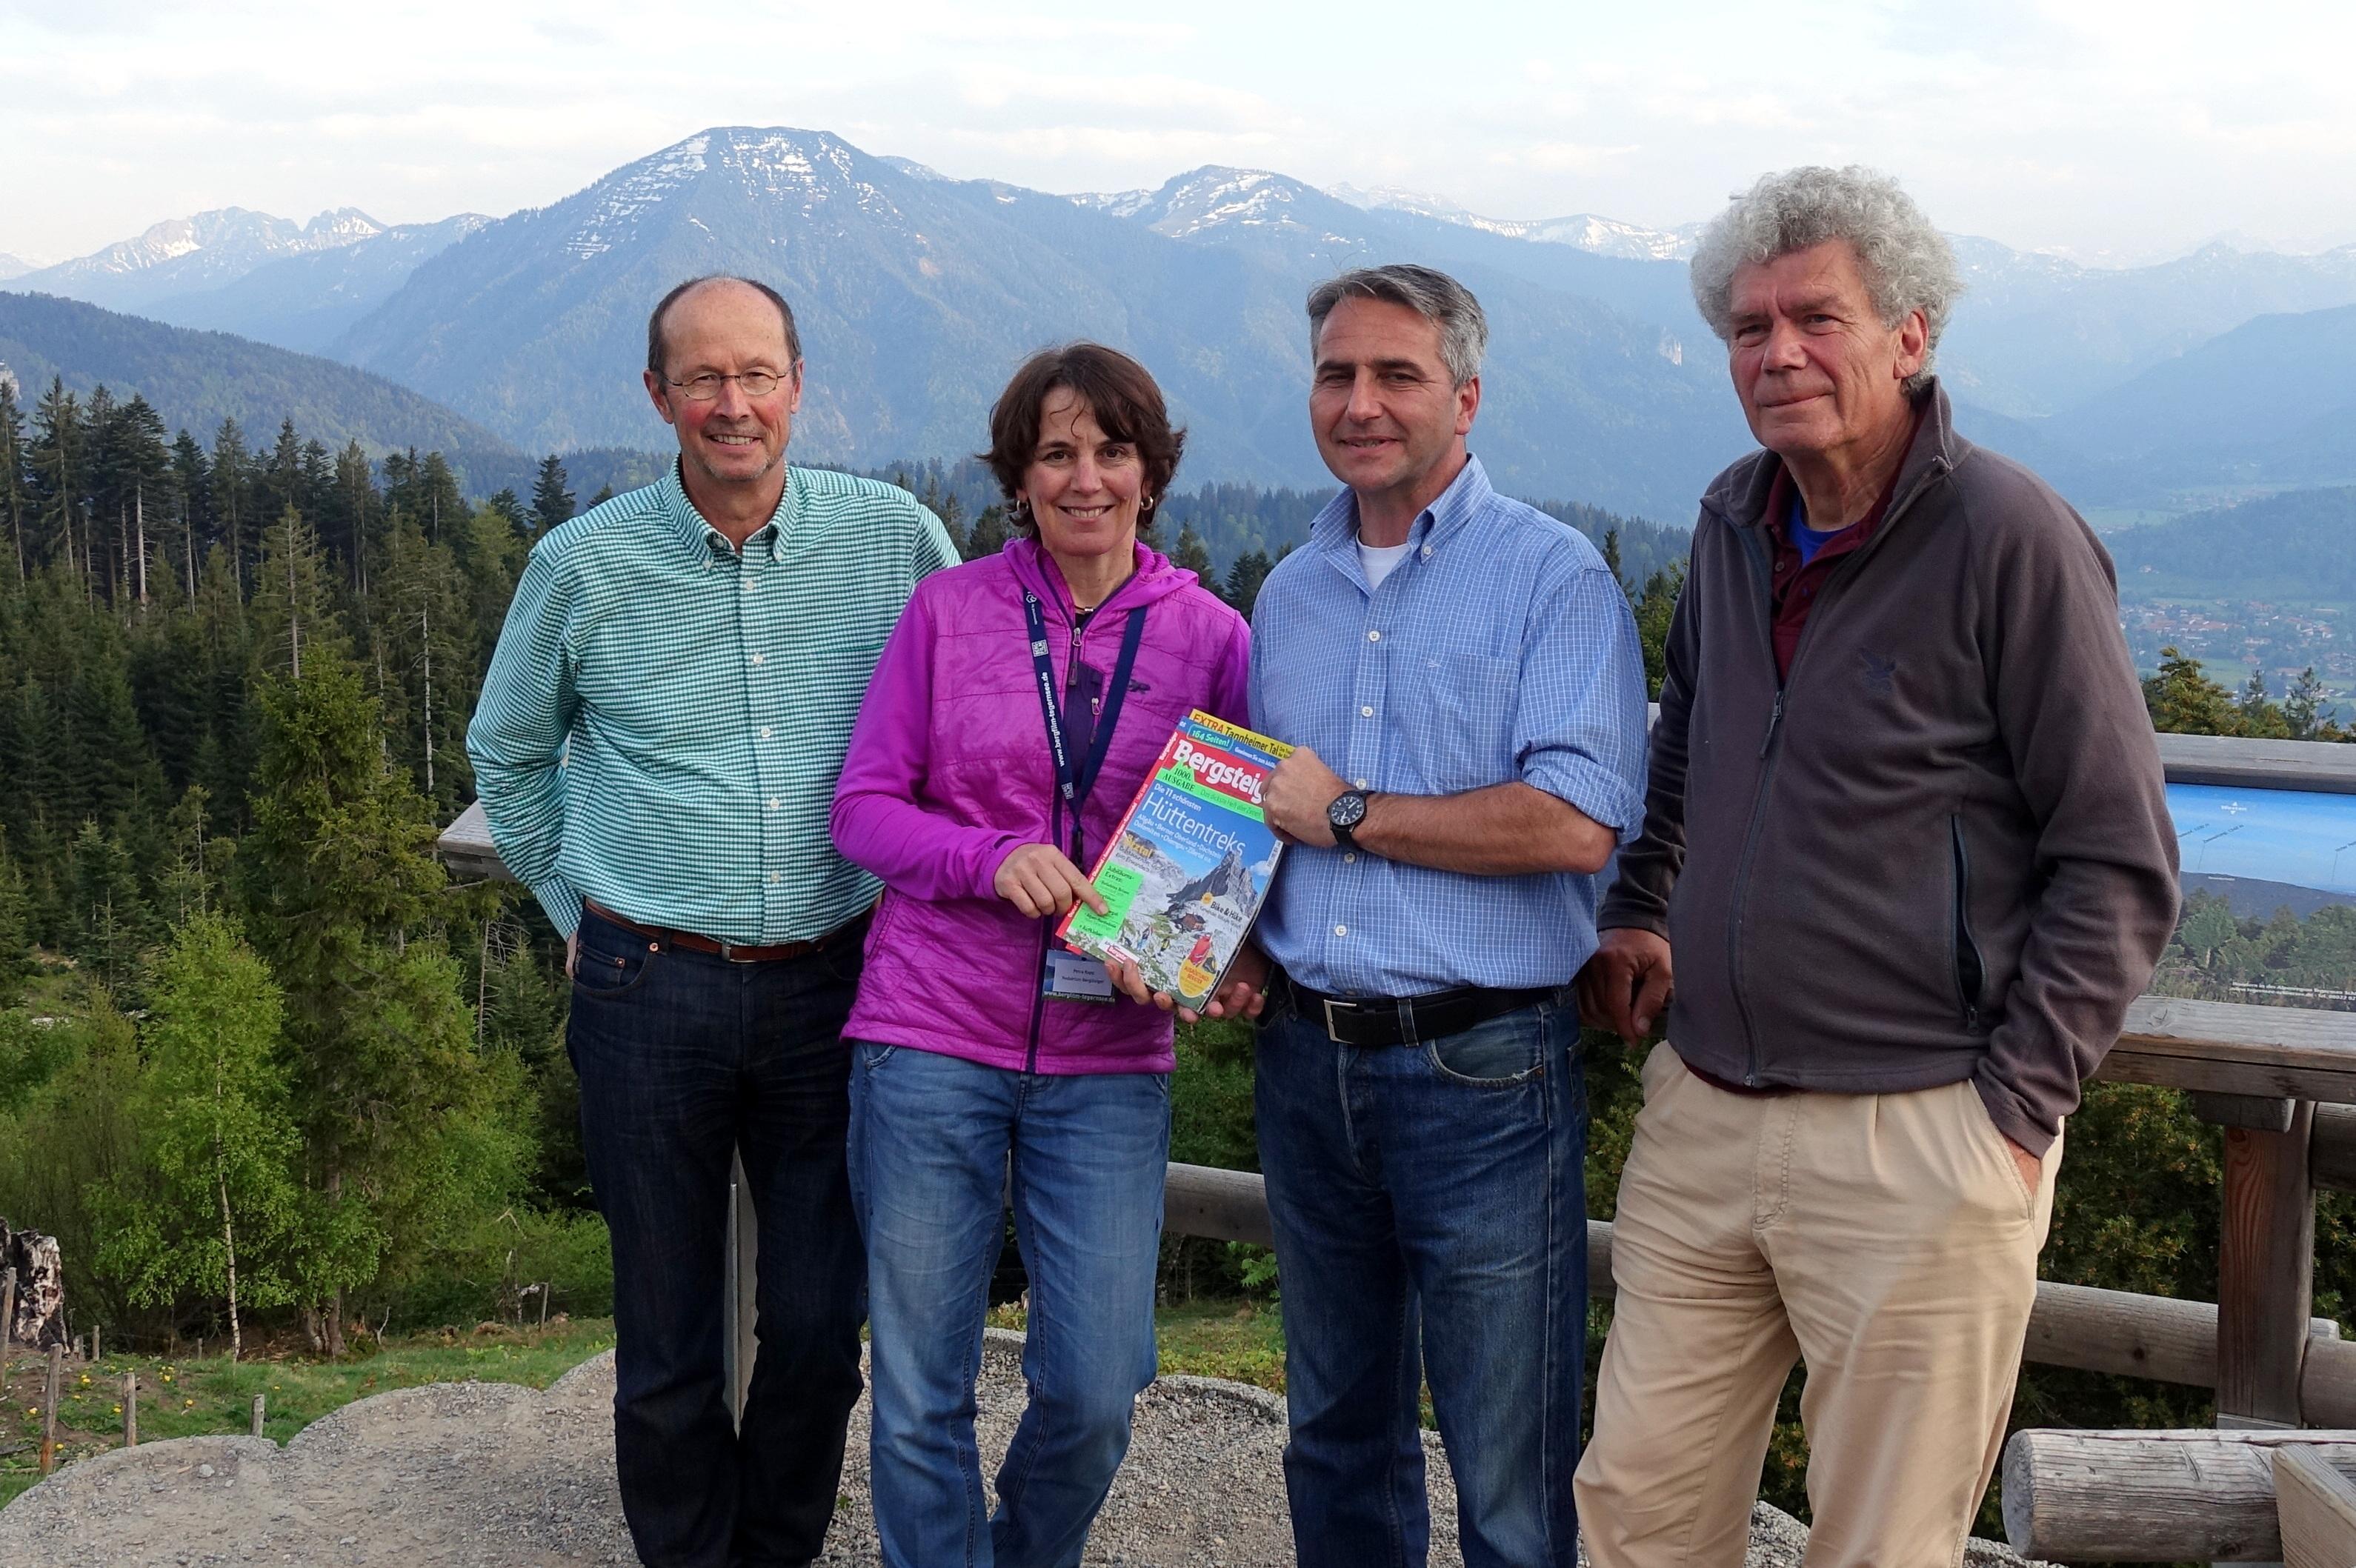 (v.l.n.r.): Michael Pause (künstlerischer Leiter), Petra Rapp (Redakteurin Bergsteiger), Johannes Hagn (Bürgermeister Stadt Tegernsee) und Peter Janssen (Mitbegründer Bergfilm-Festival)